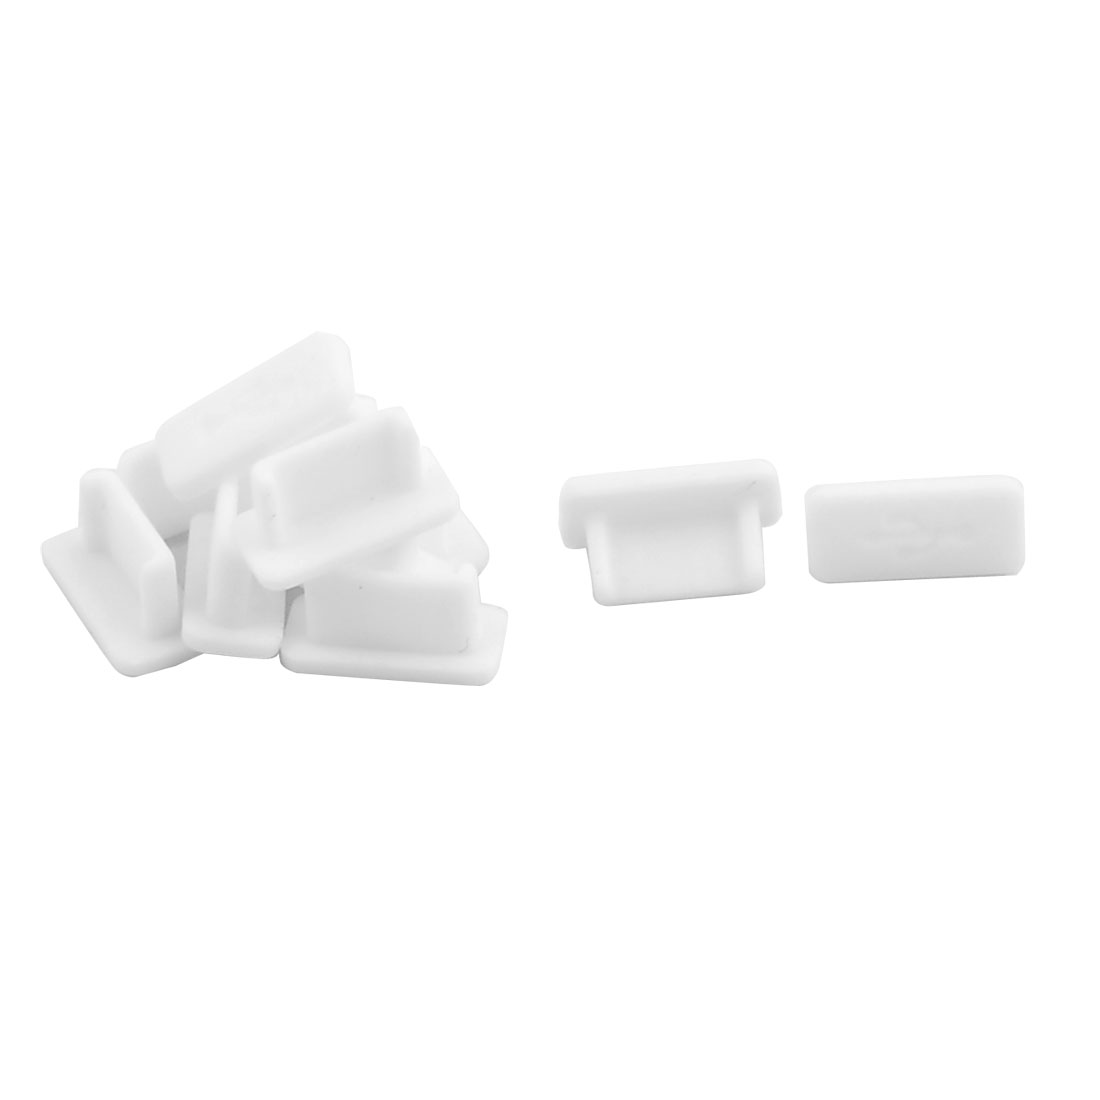 Laptop Rubber Female Port Anti Dust Cover Cap White 10pcs for USB Type C